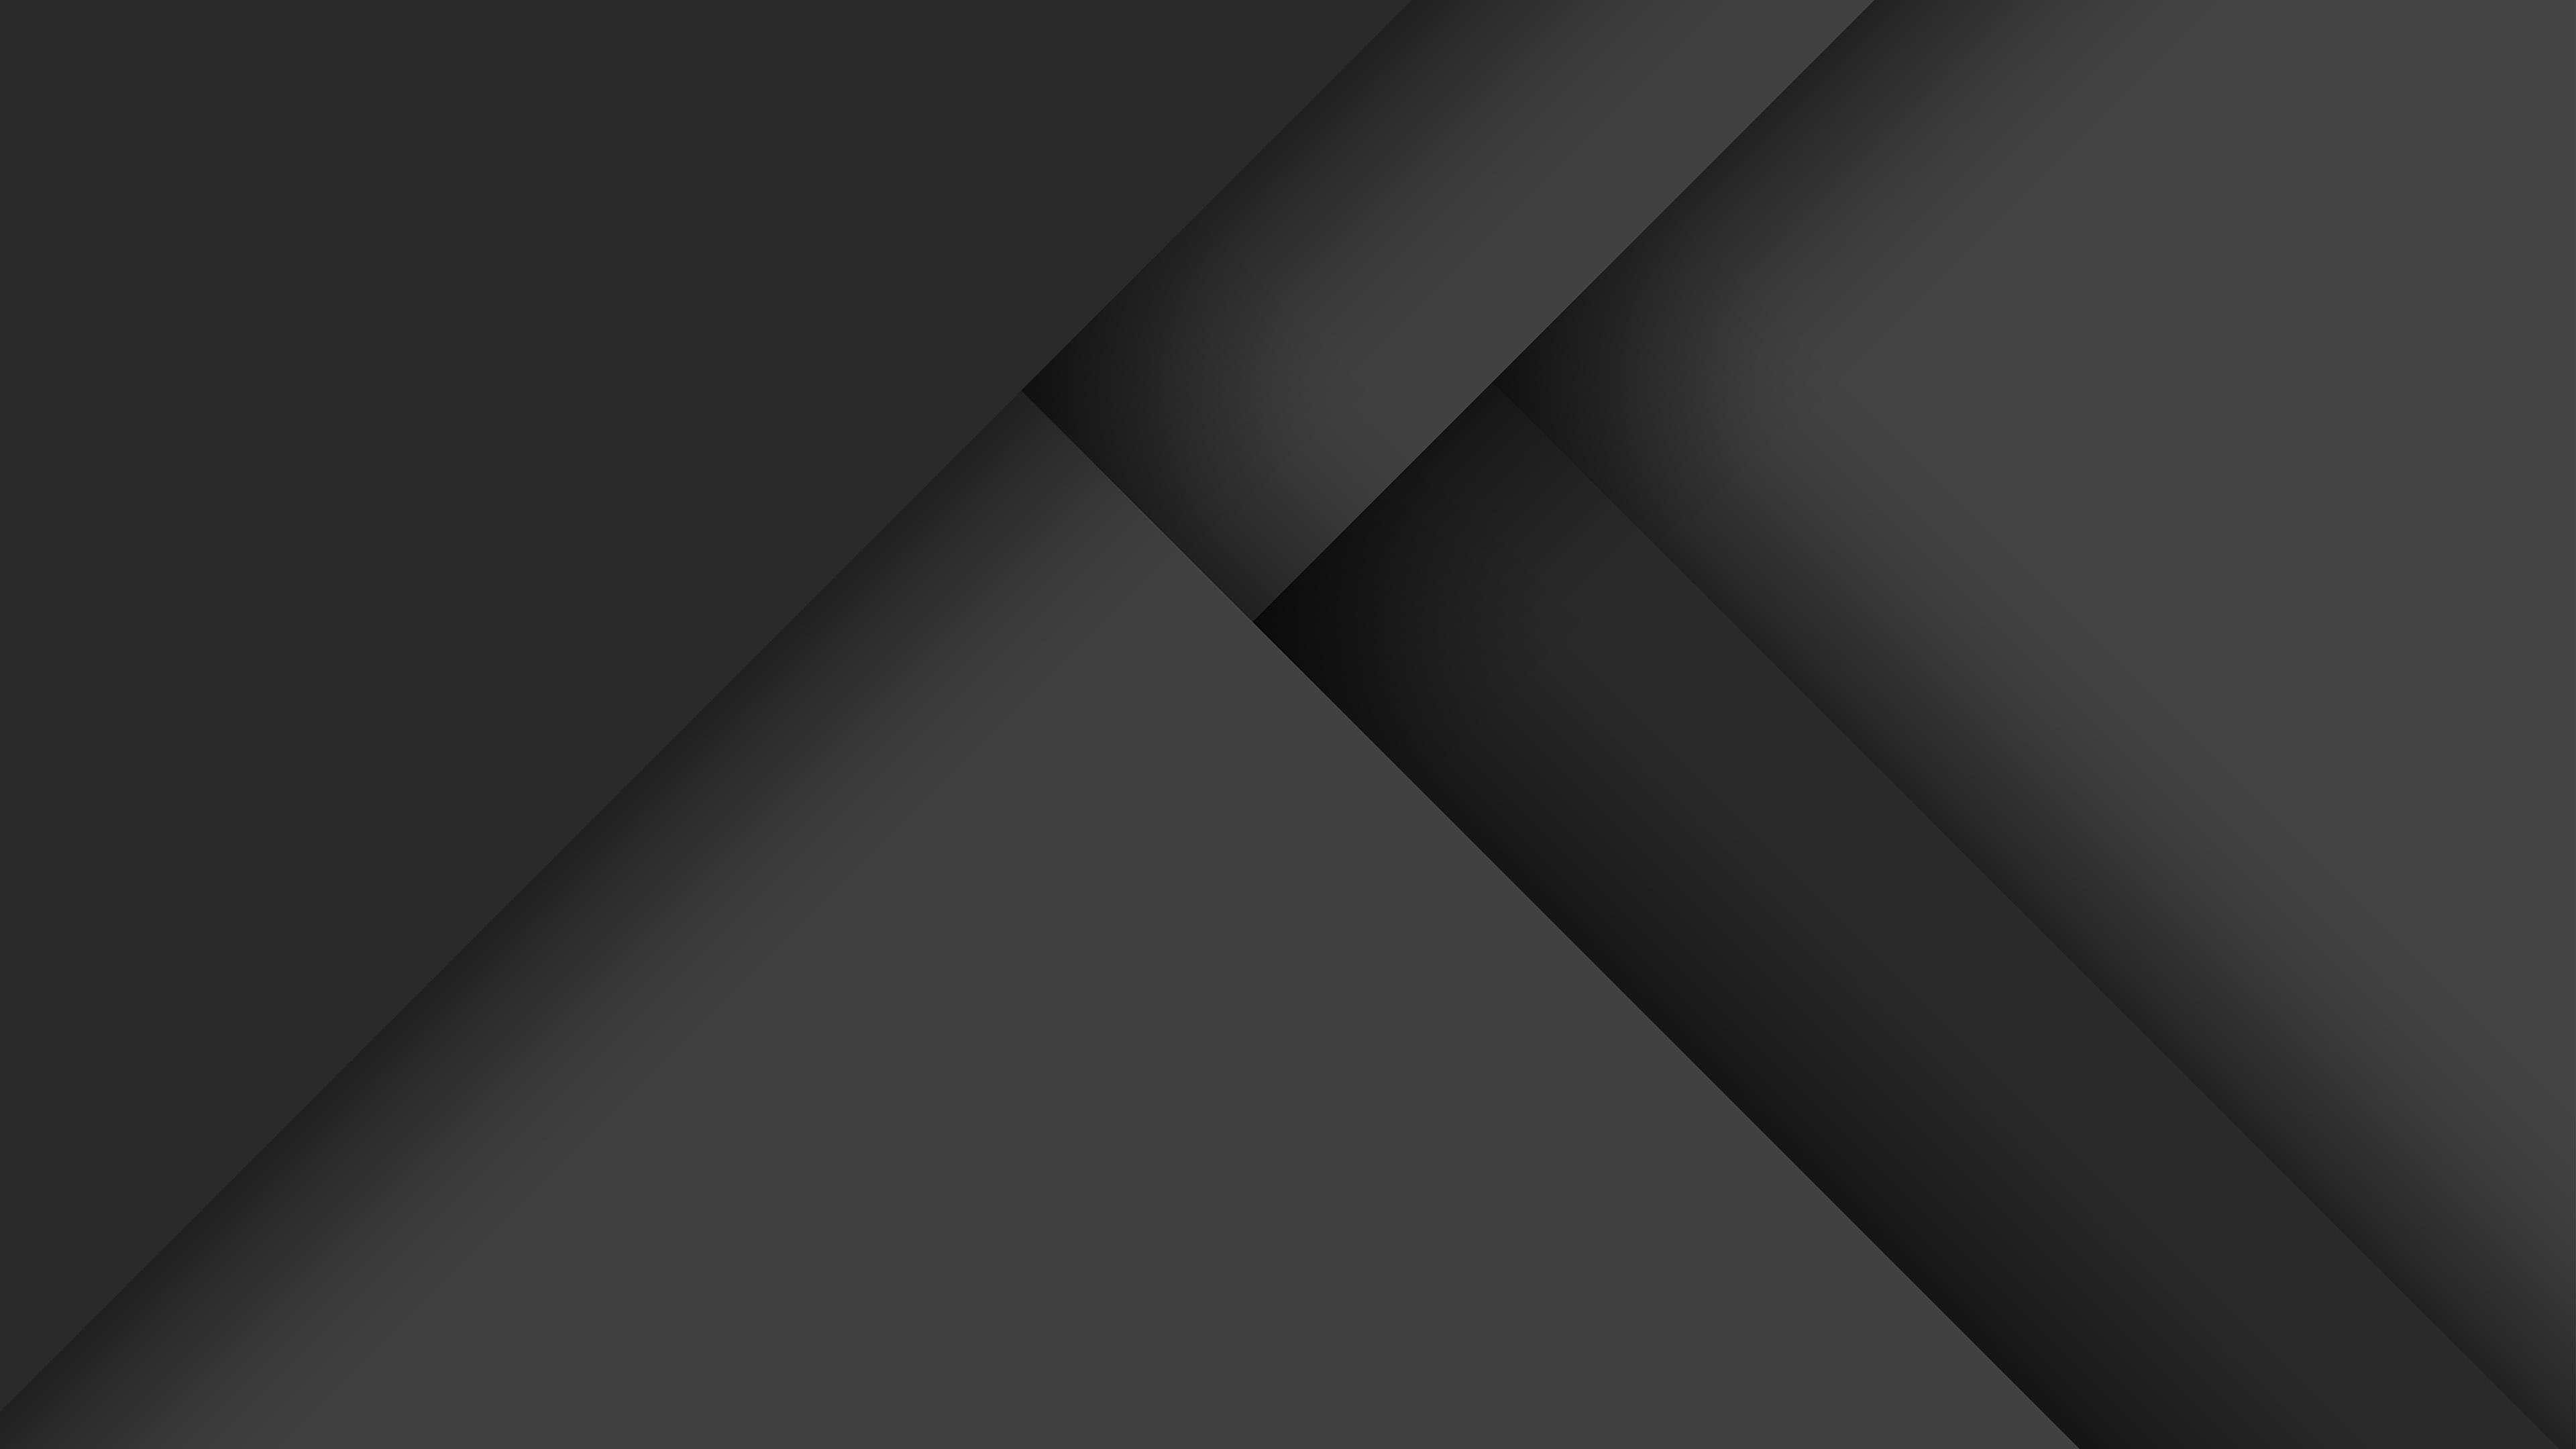 Iphone 7 Plus Christmas Wallpaper Vk50 Android Lollipop Material Design Dark Bw Pattern